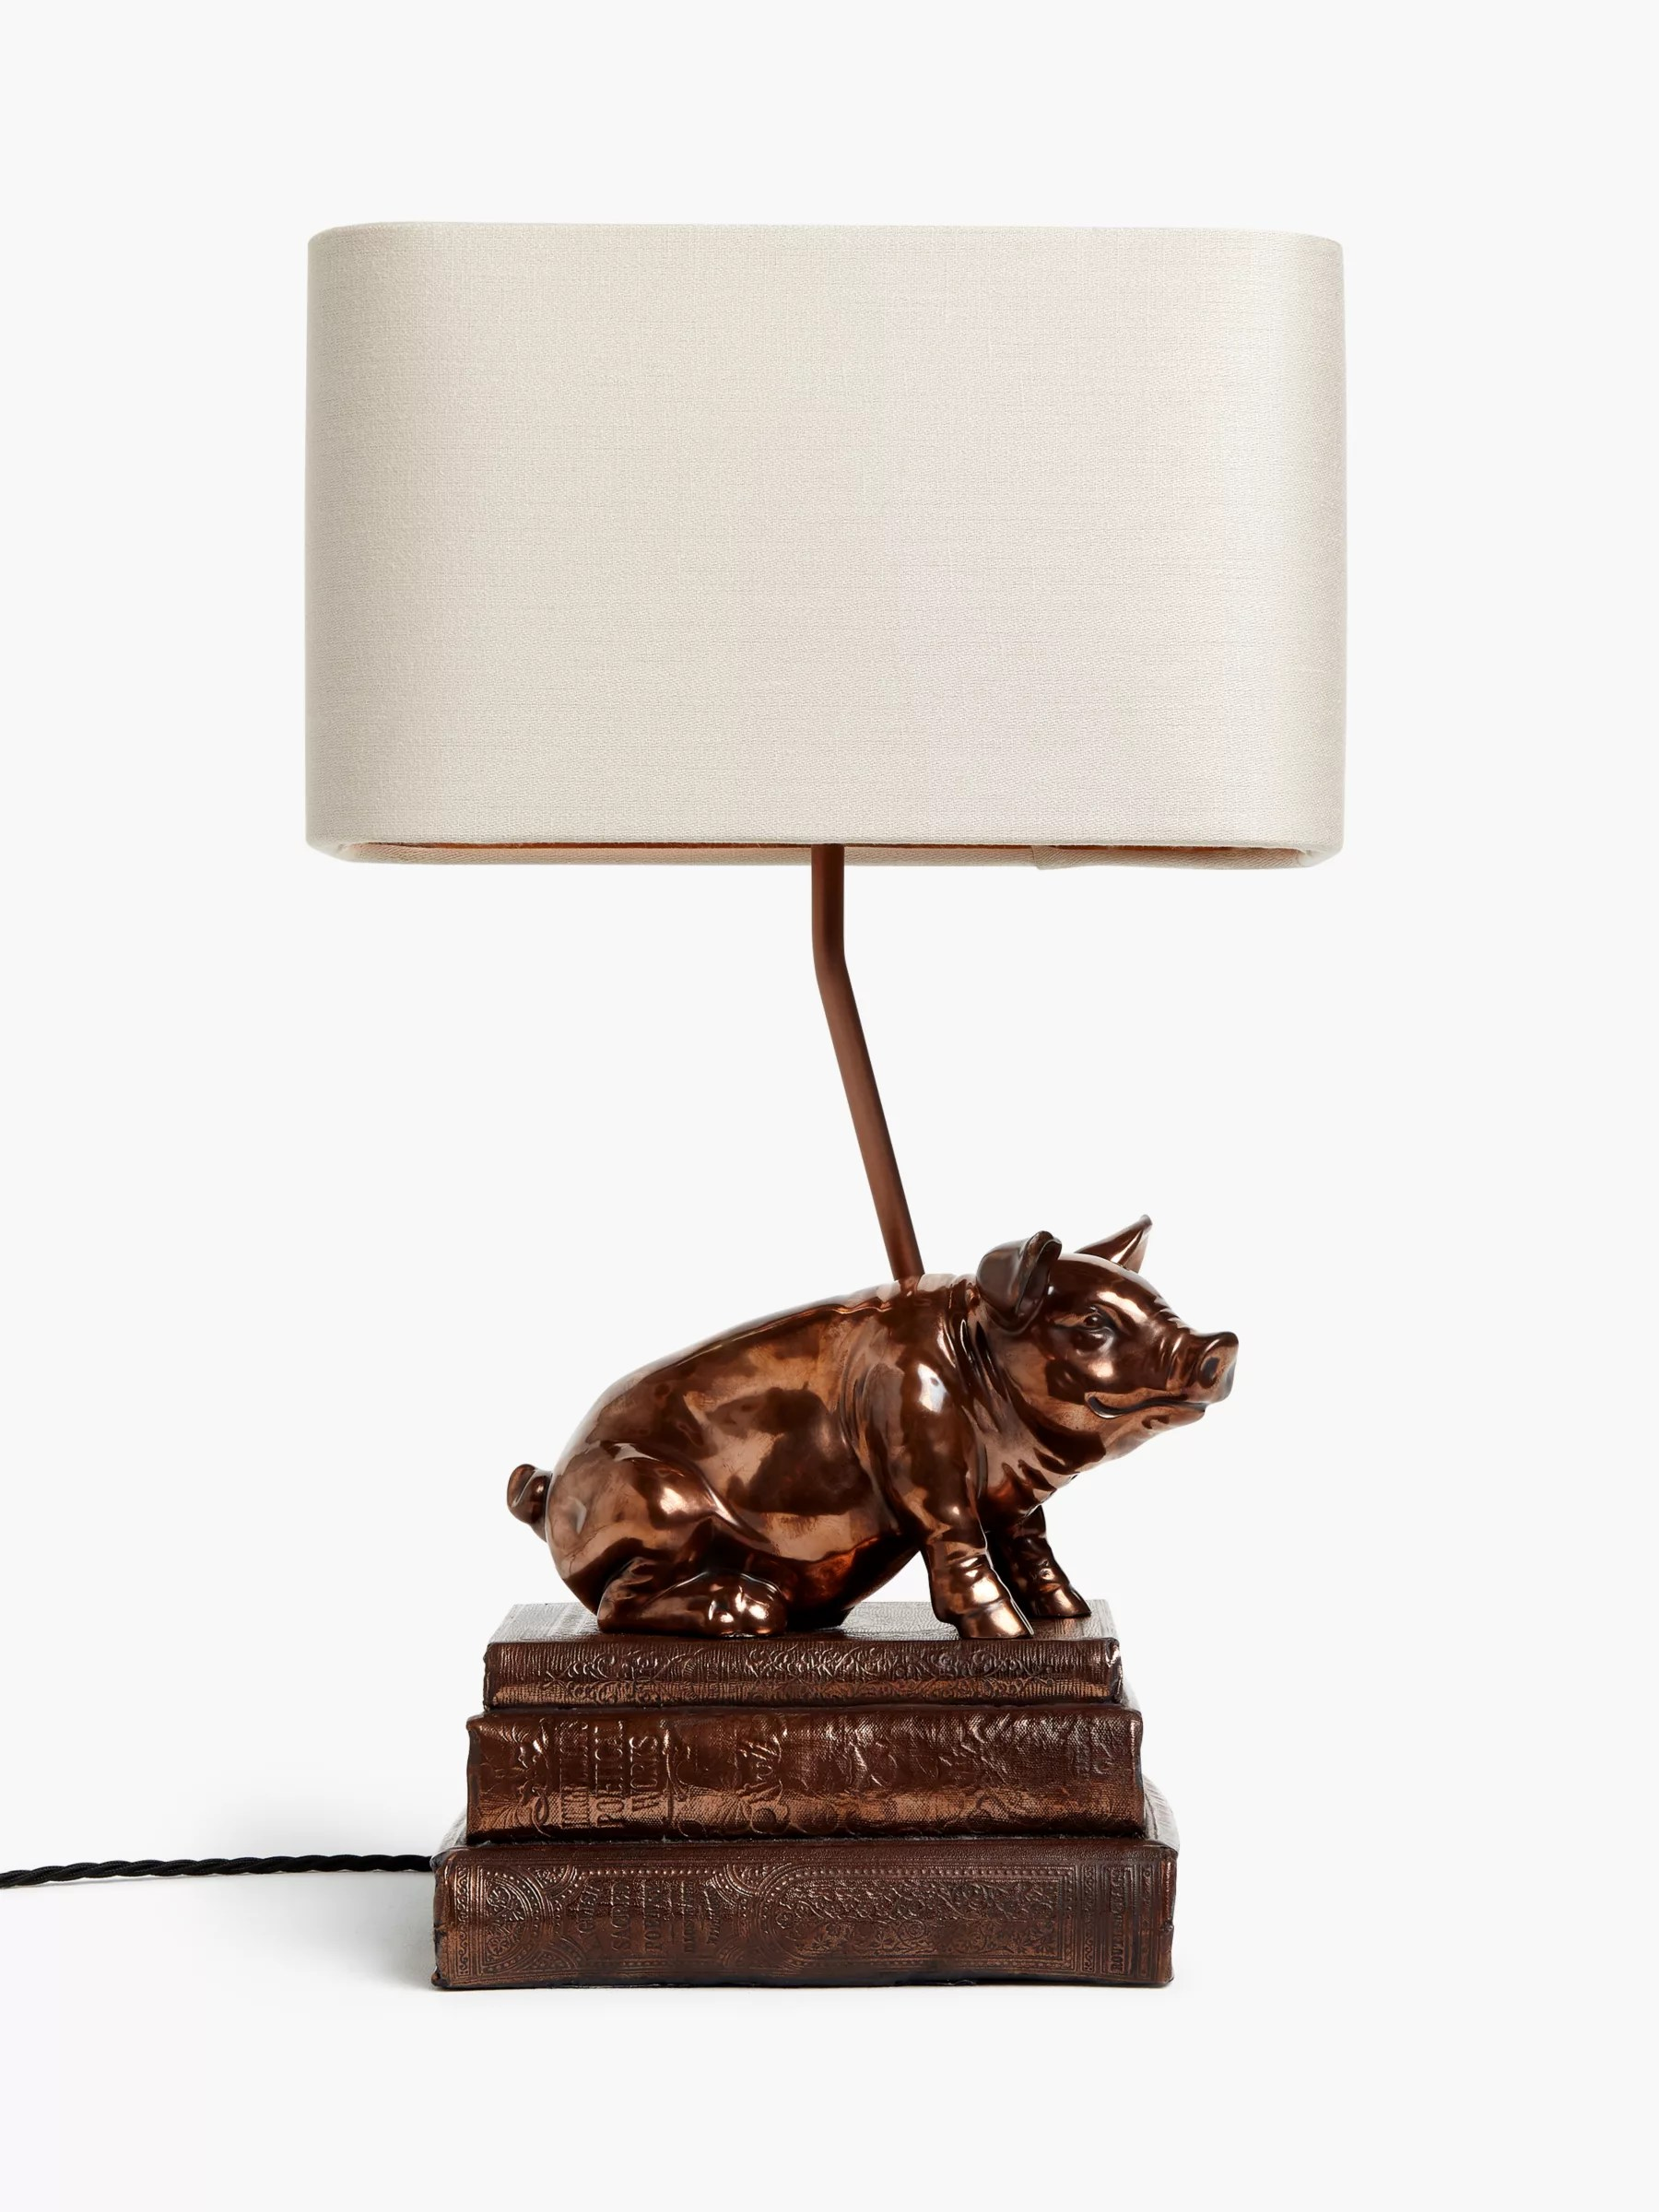 lamps for living room rooms sale table furniture john lewis partners david hunt frank the pig lamp copper